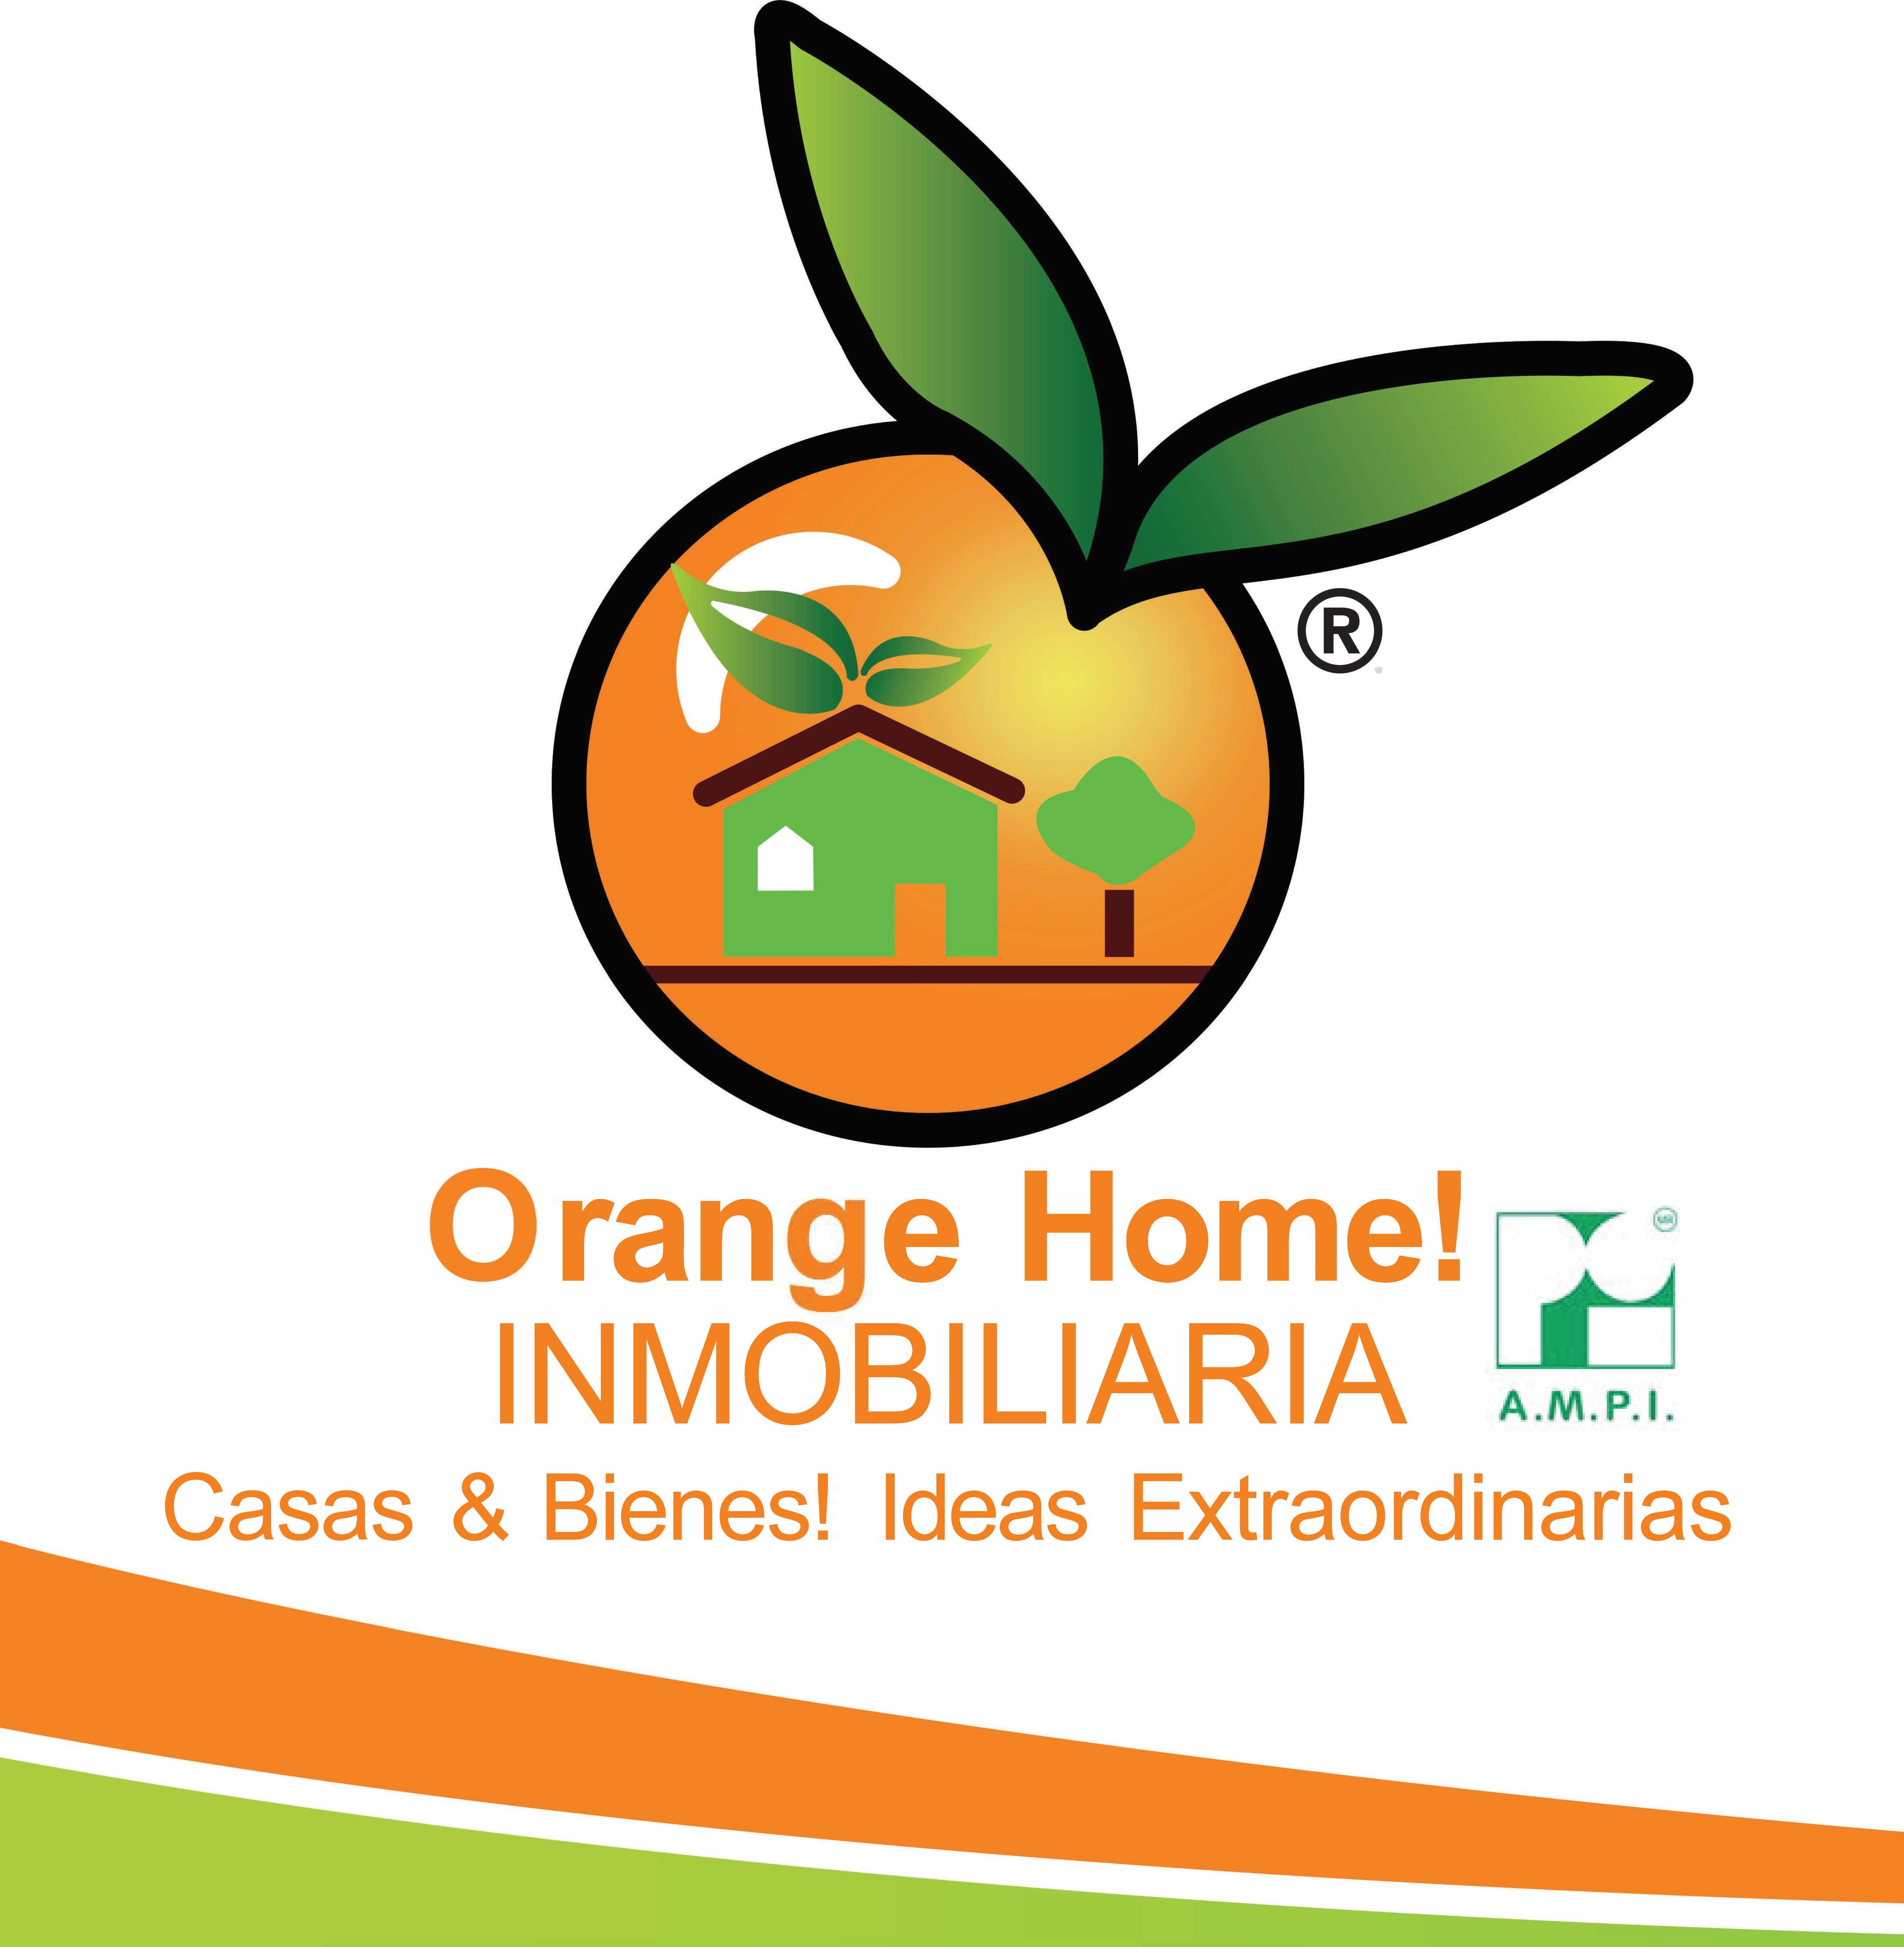 INMOBILIARIA-ORANGE-HOME